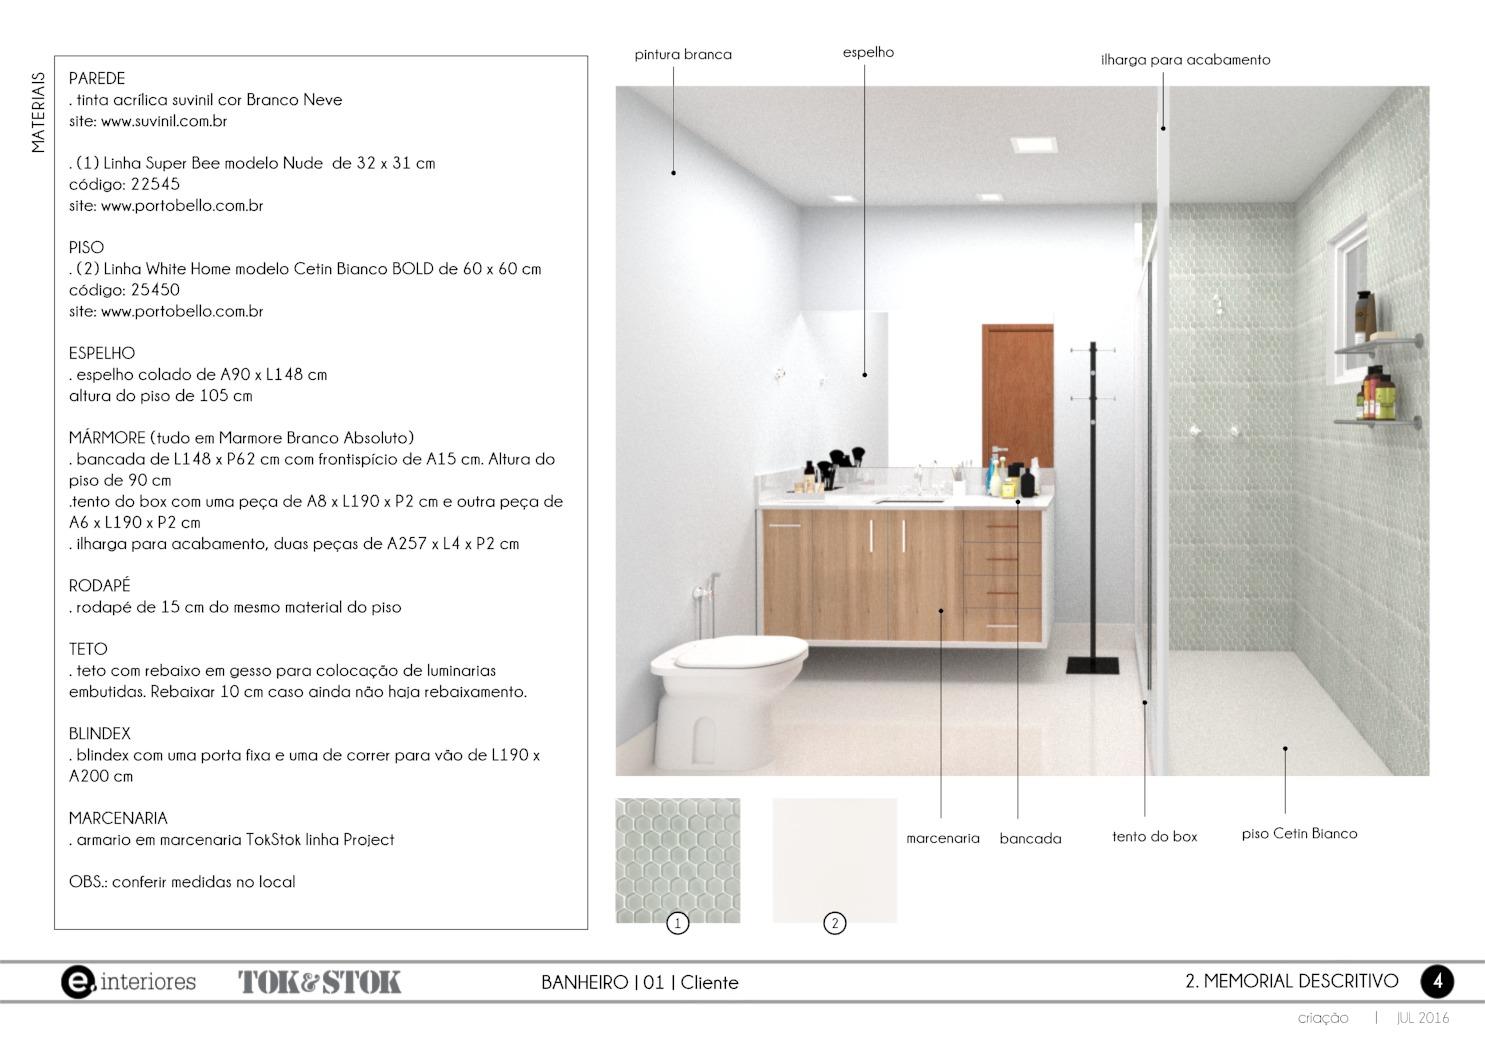 E Interiores Next Generation Interior Design With Blender Home Of The Blender